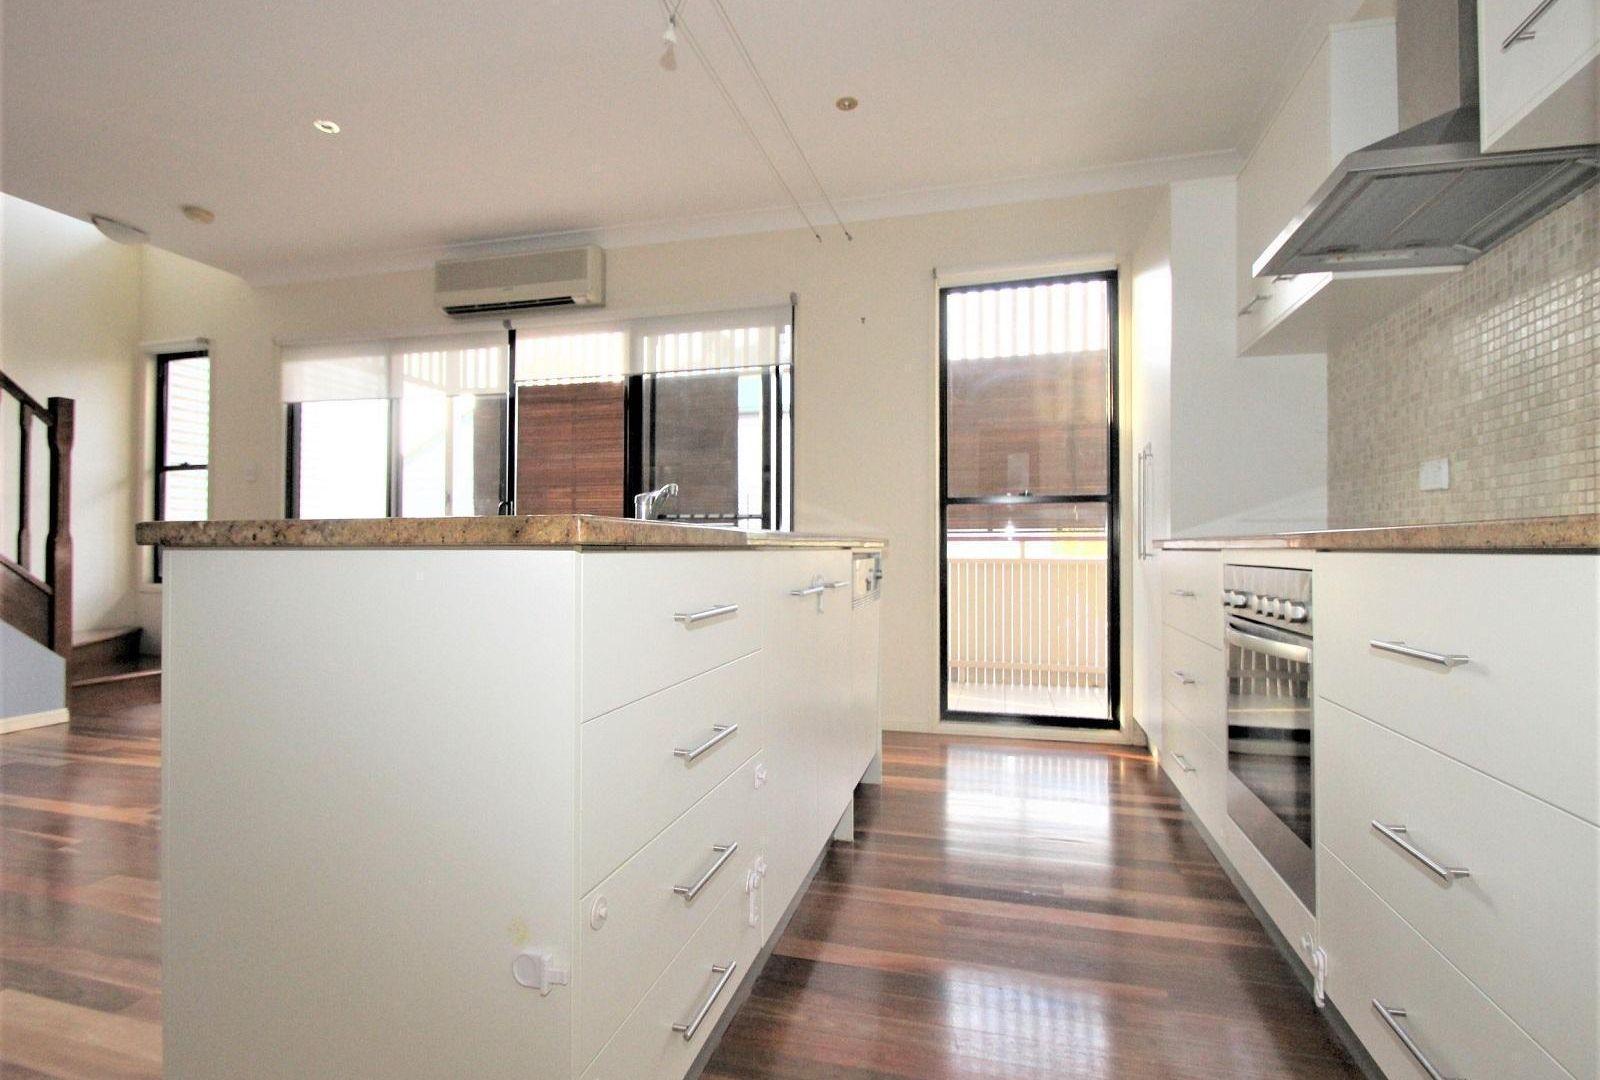 3/59 Tait Street, Kelvin Grove QLD 4059, Image 1